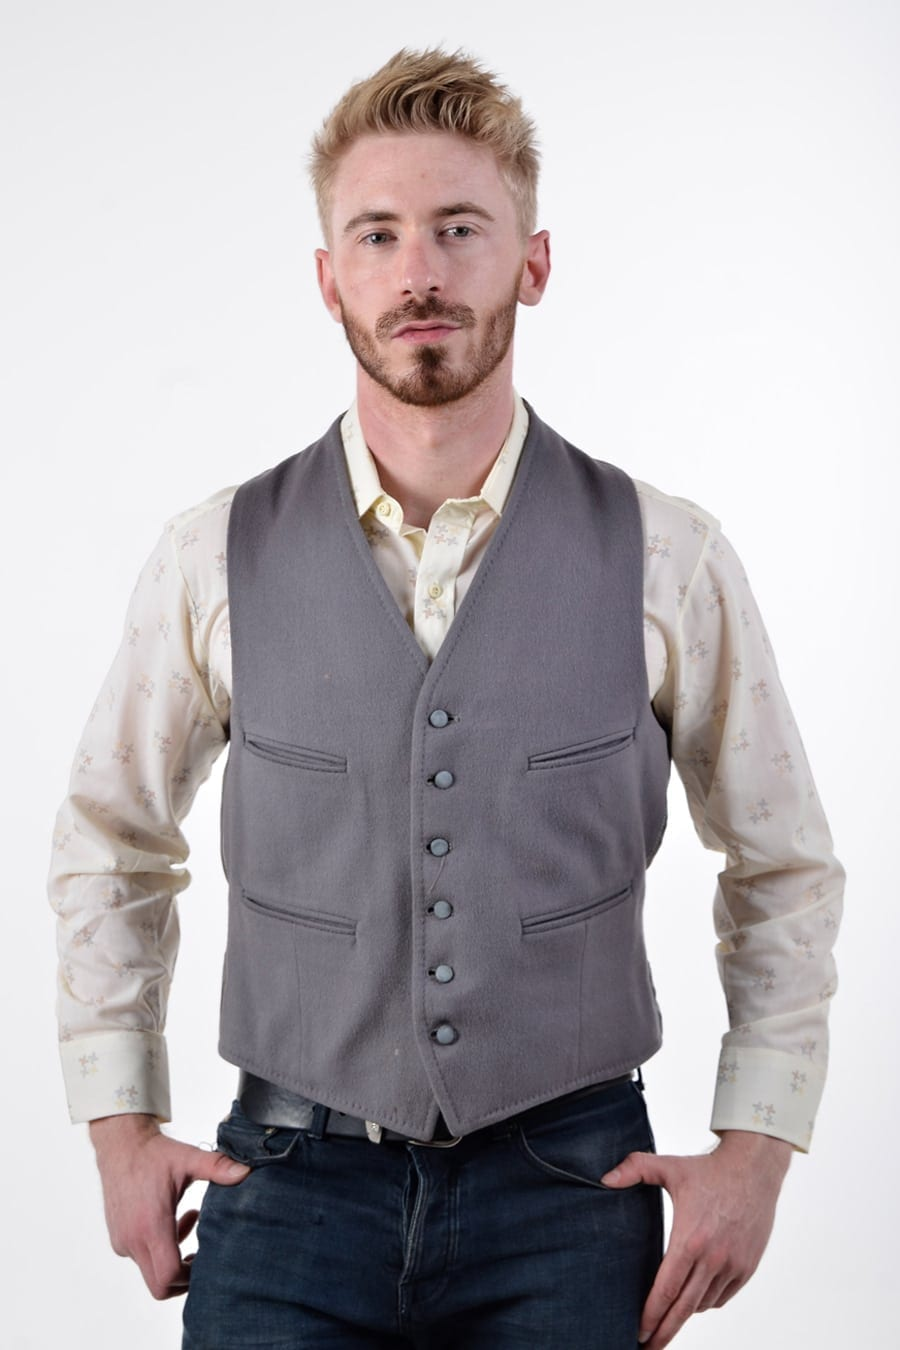 Vintage Dunn & Co men's waistcoat